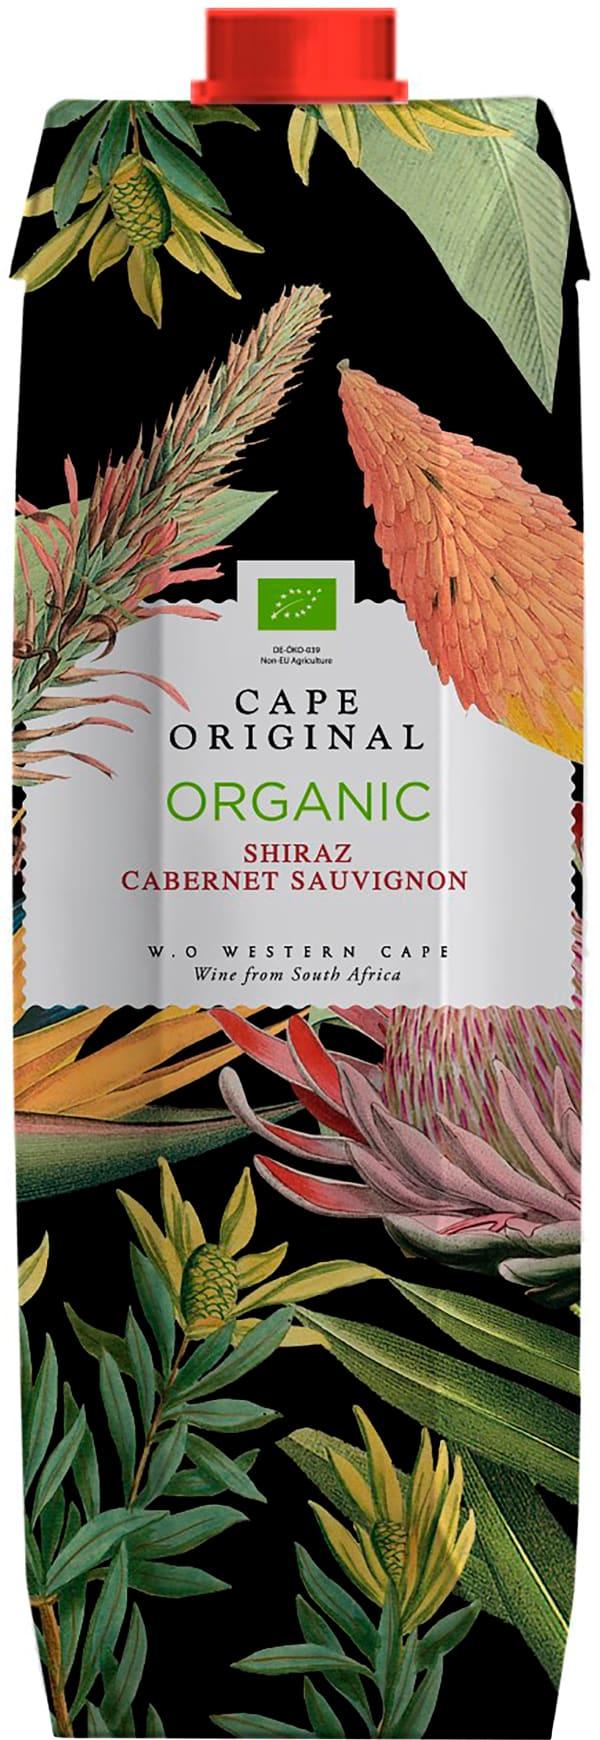 Cape Original Shiraz Cabernet Sauvignon Organic 2017 carton package